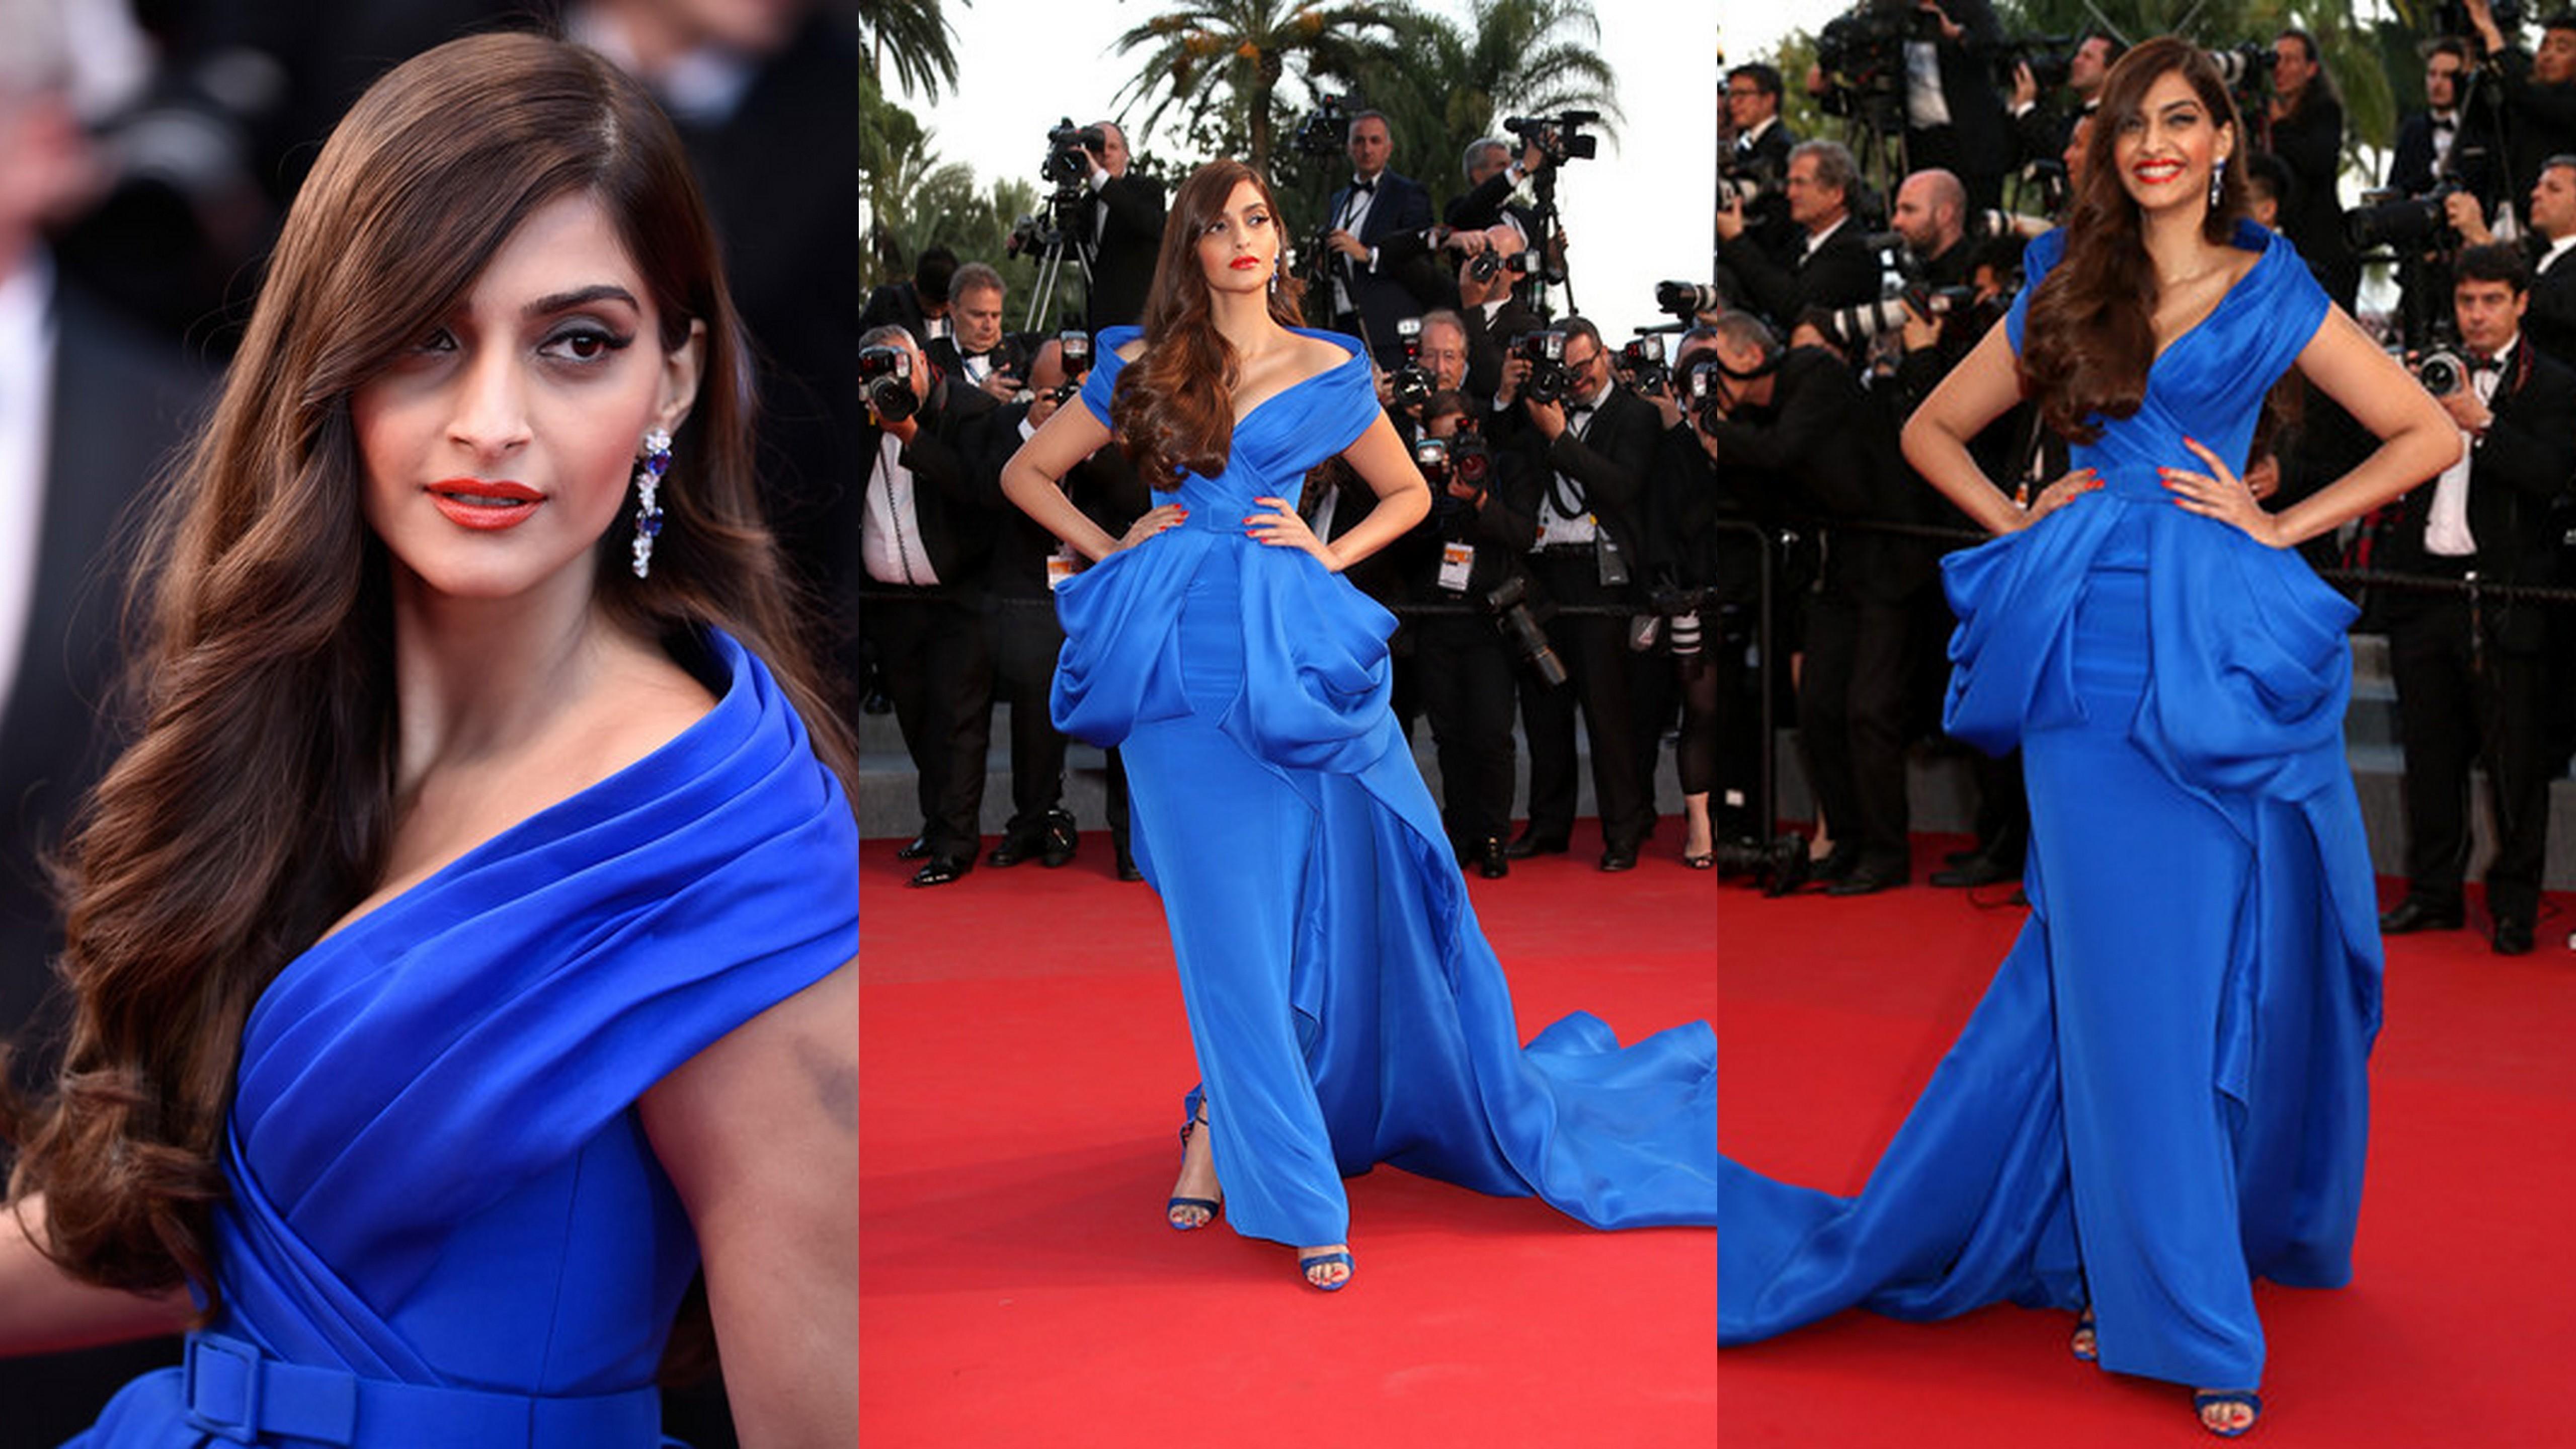 Sonam Kapoor's Blue Gown